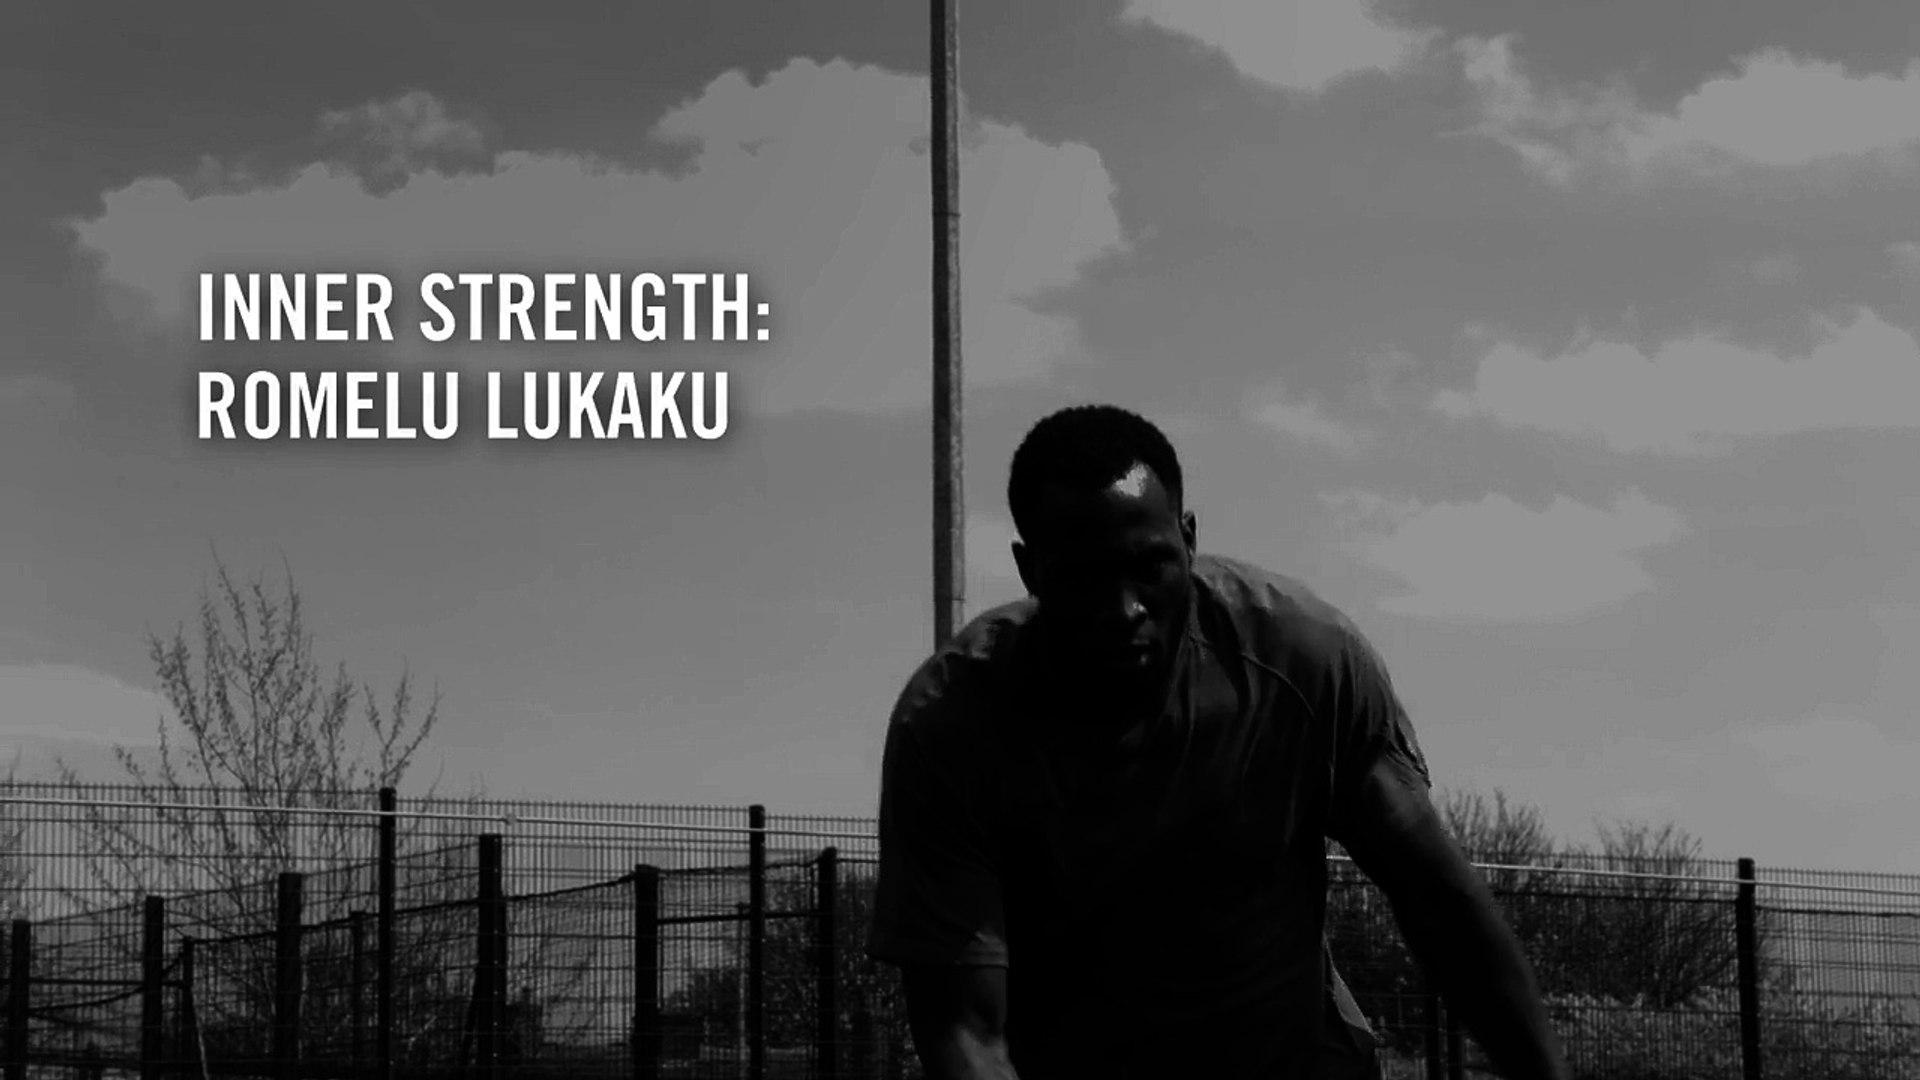 Romelu Lukaku stars in new Nike ad Inner Strength